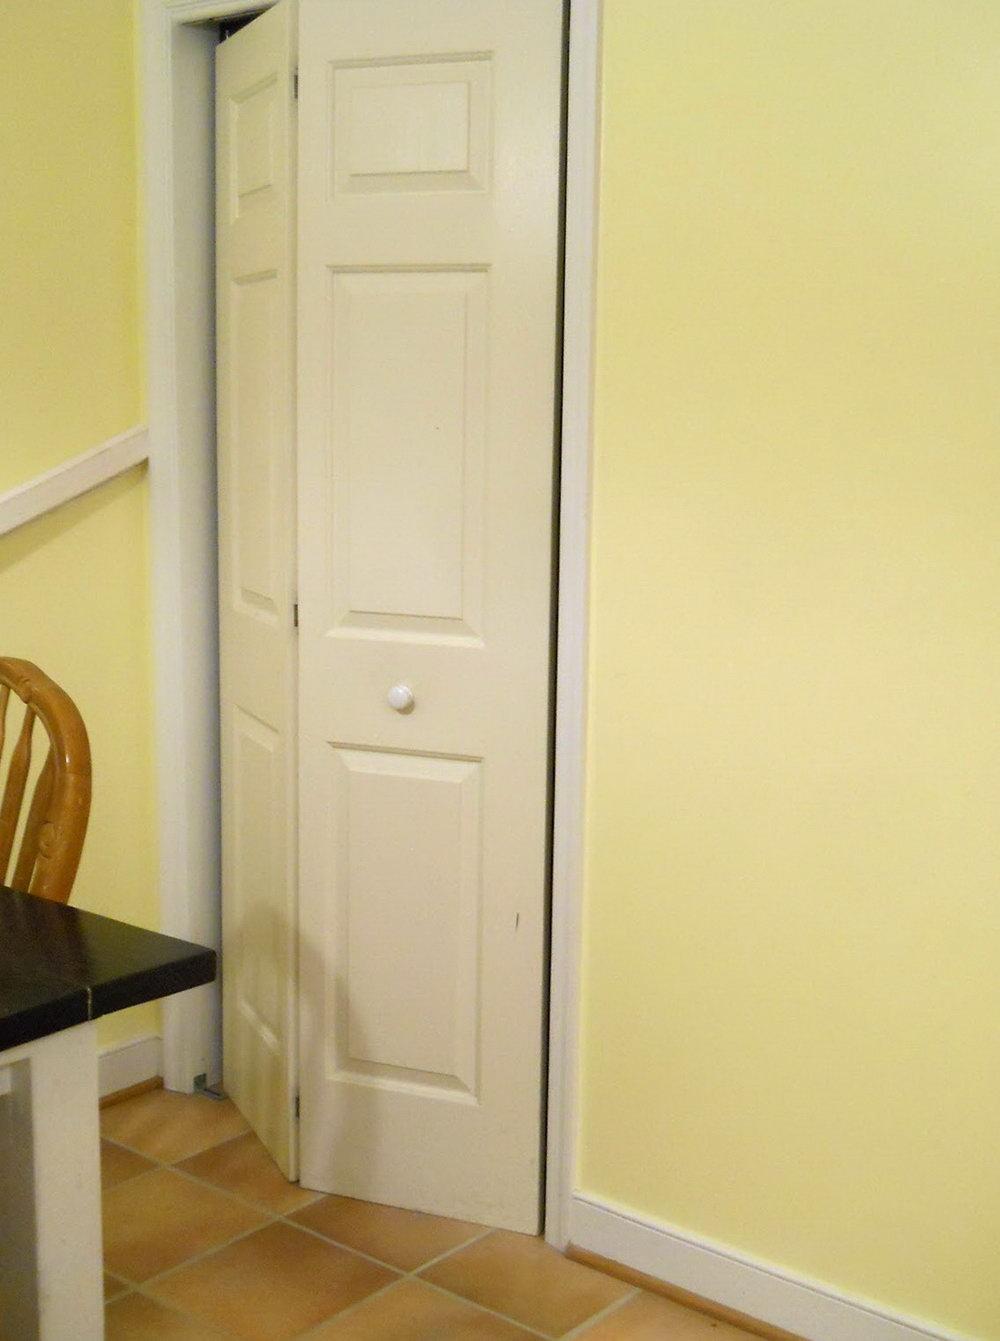 Reliabilt Closet Doors Installation Instructions